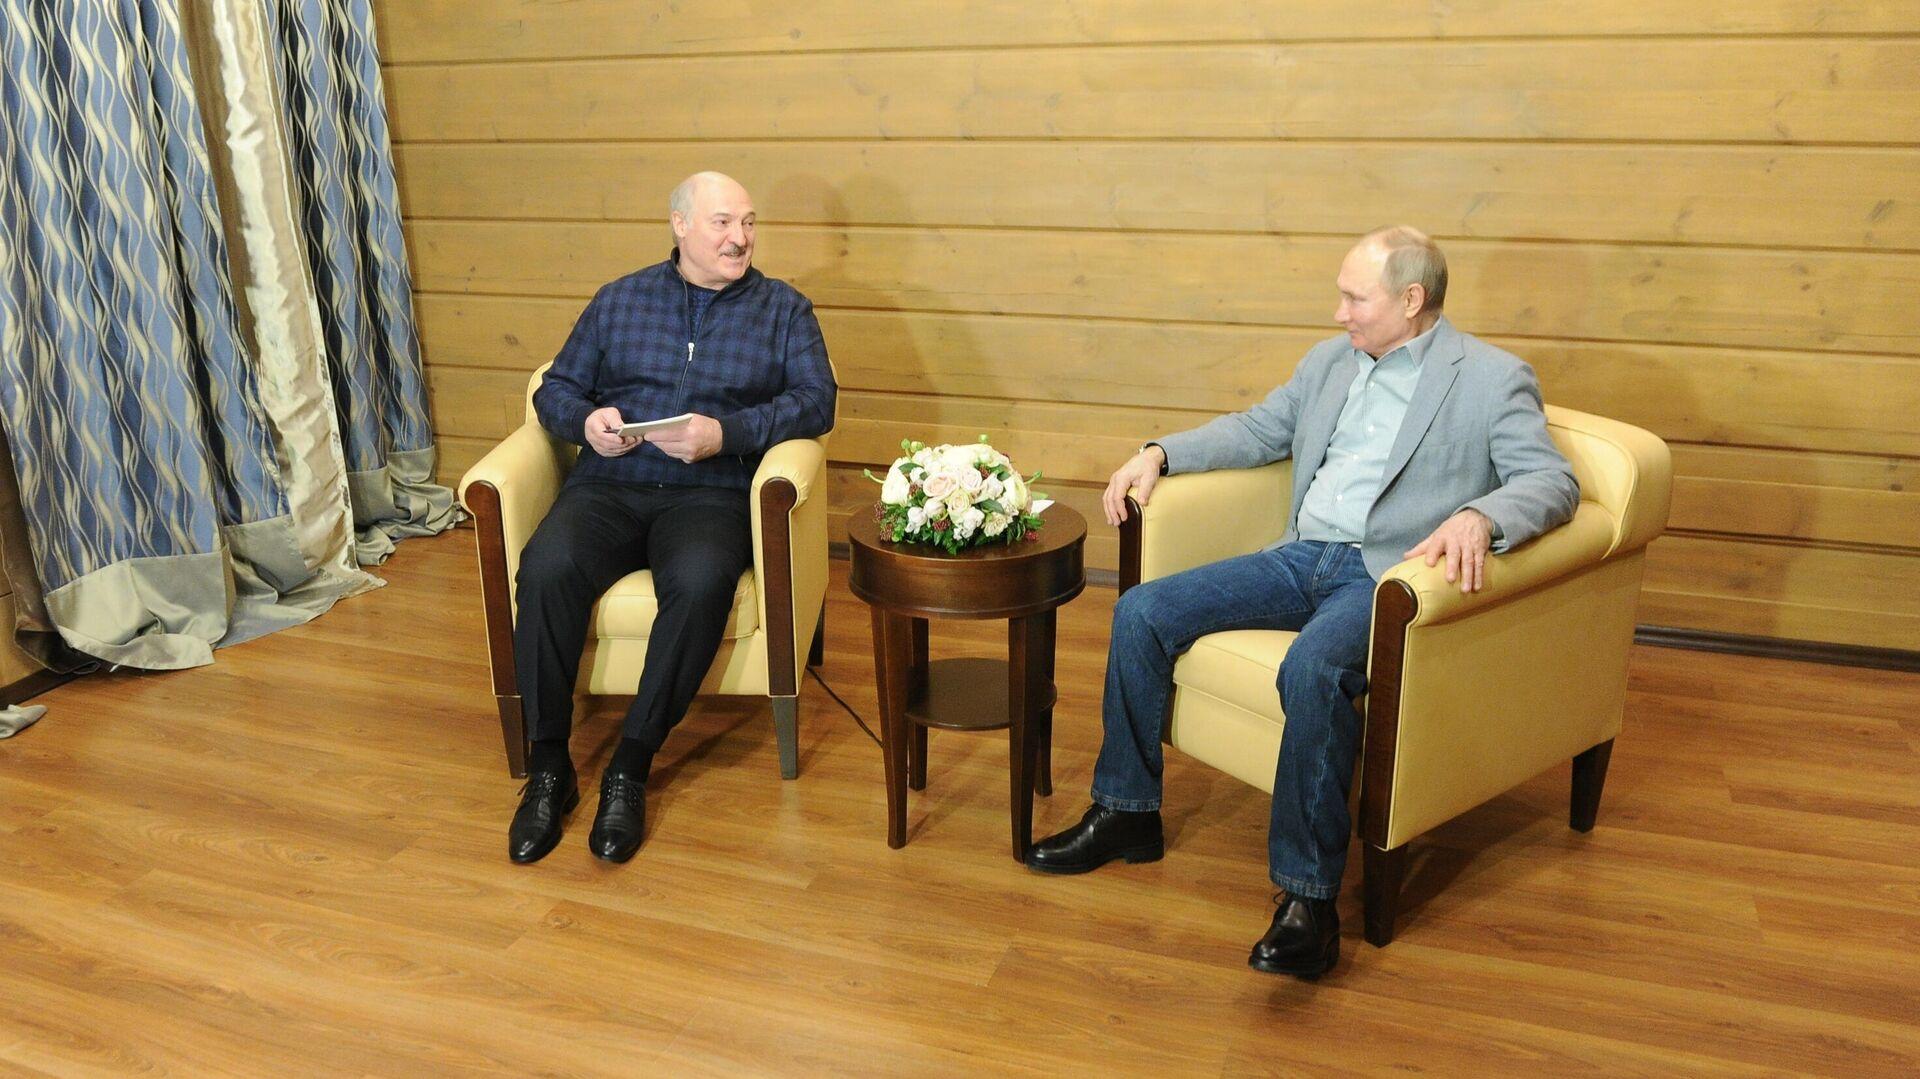 Президент РФ Владимир Путин и президент Белоруссии Александр Лукашенко во время встречи - РИА Новости, 1920, 24.02.2021